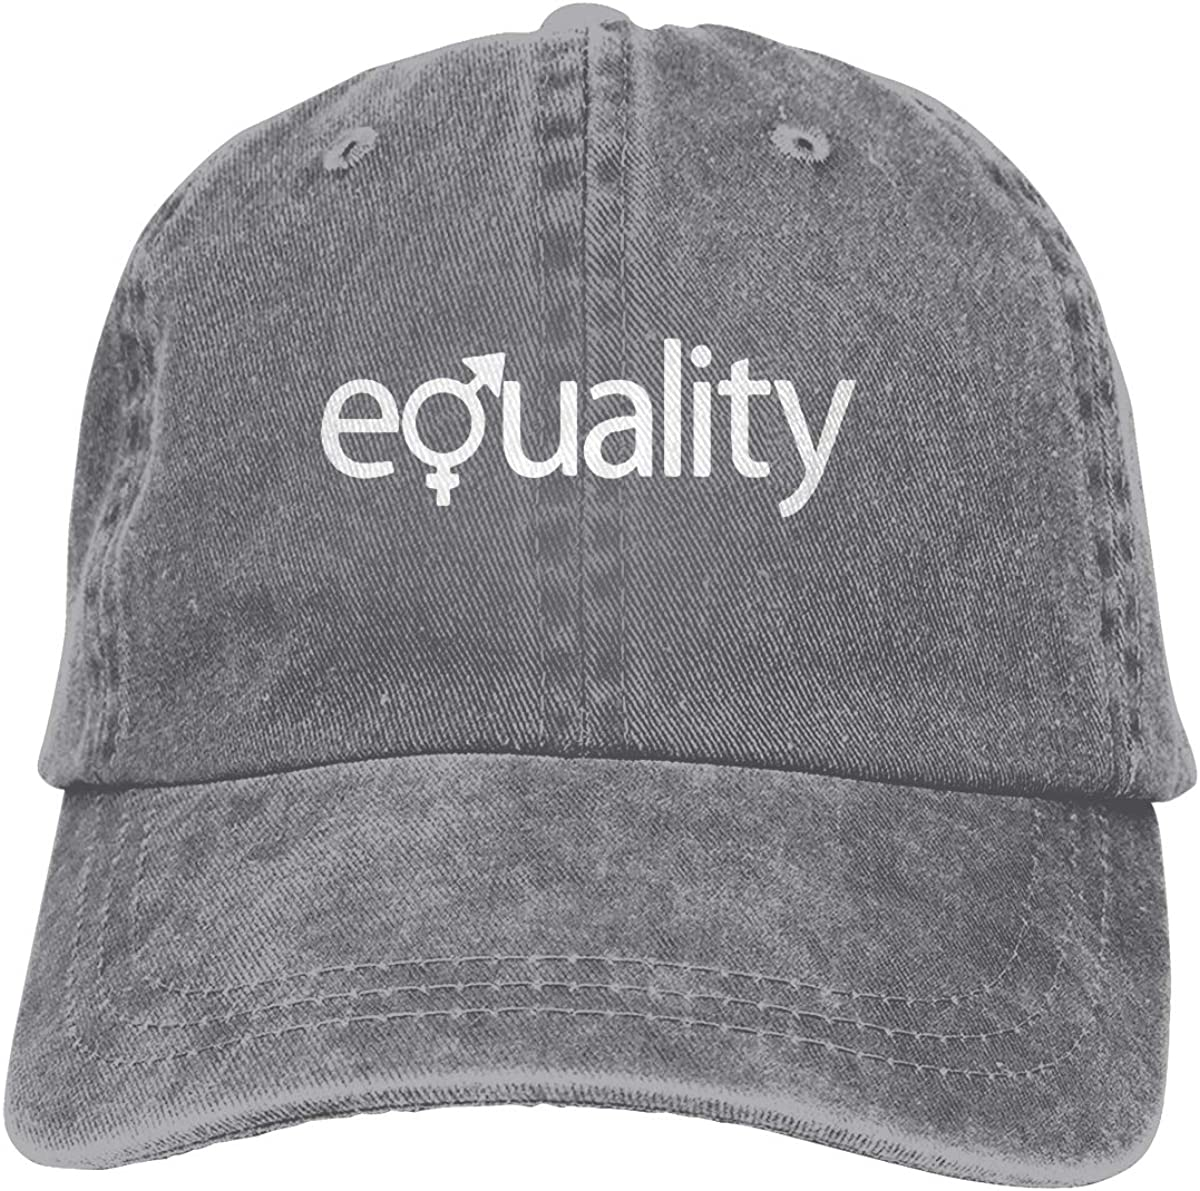 Gender Equality Unisex Trendy Cowboy Sun Hat Adjustable Baseball Cap